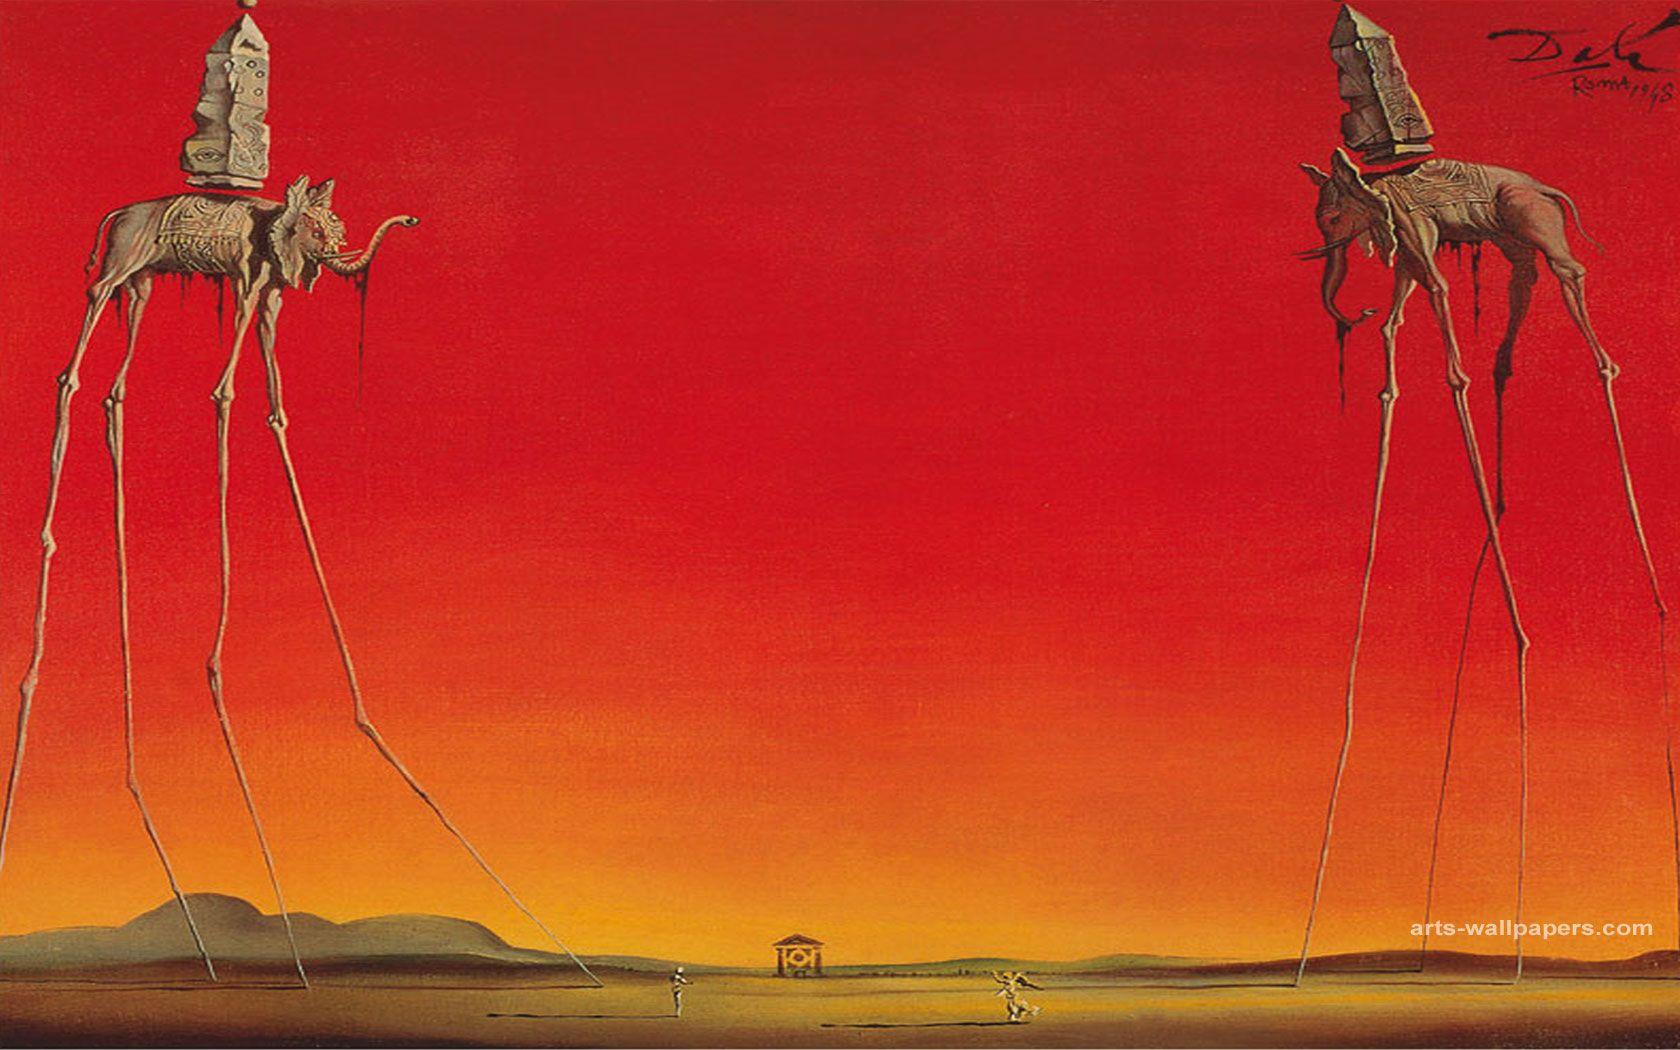 The Elephants By Salvador Dali